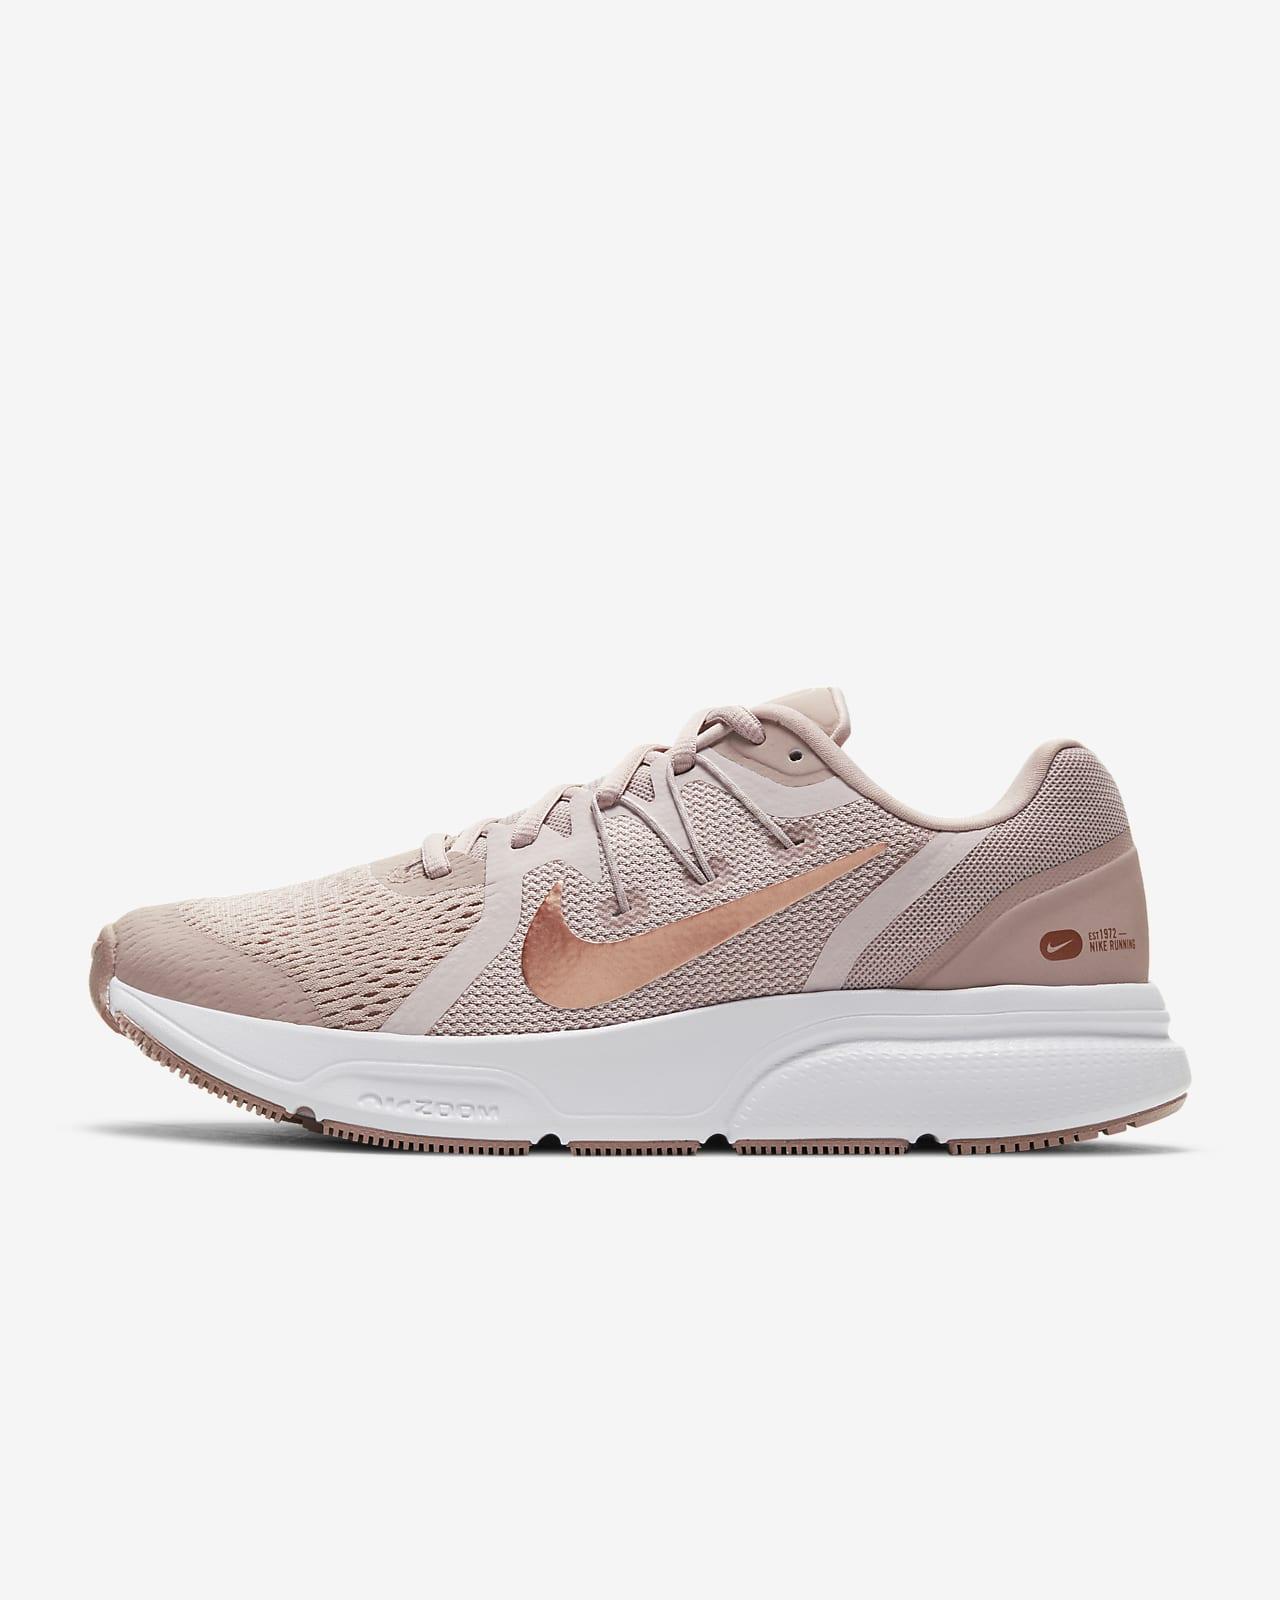 Nike Zoom Span 3 Women's Running Shoe